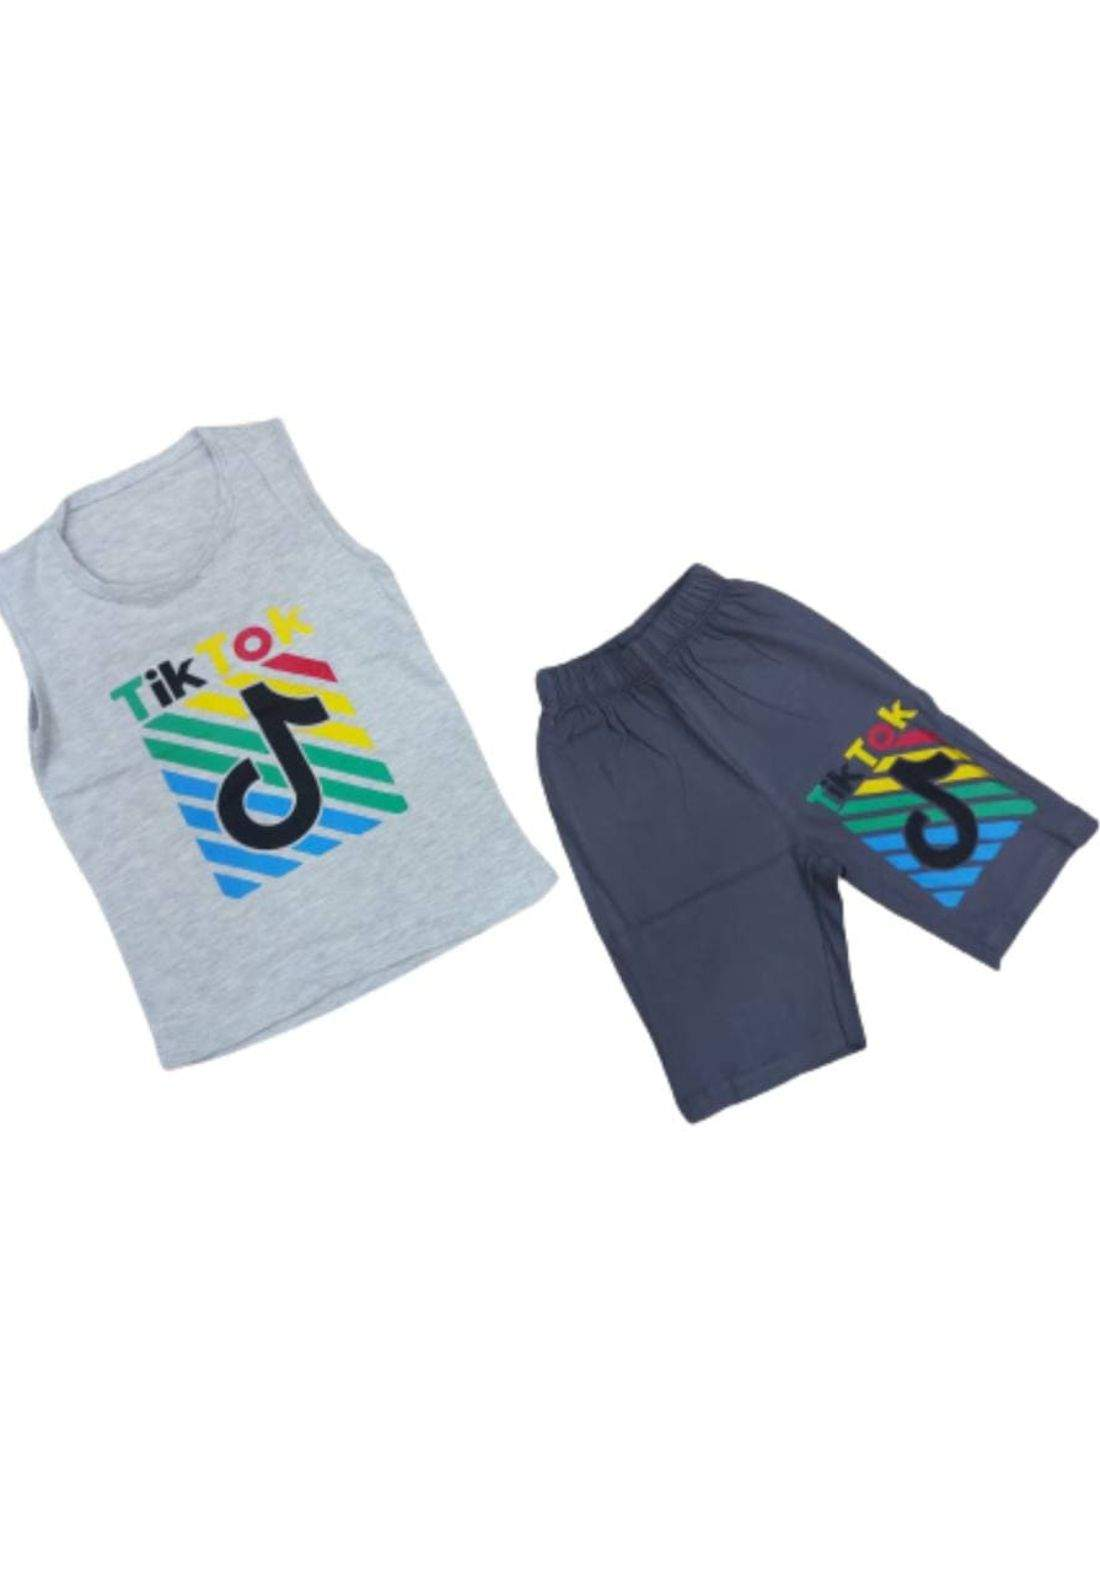 tracksuit for boys  grey(shirt +short) ( تراكسوت ولادي رمادي (برموده وكيمونه